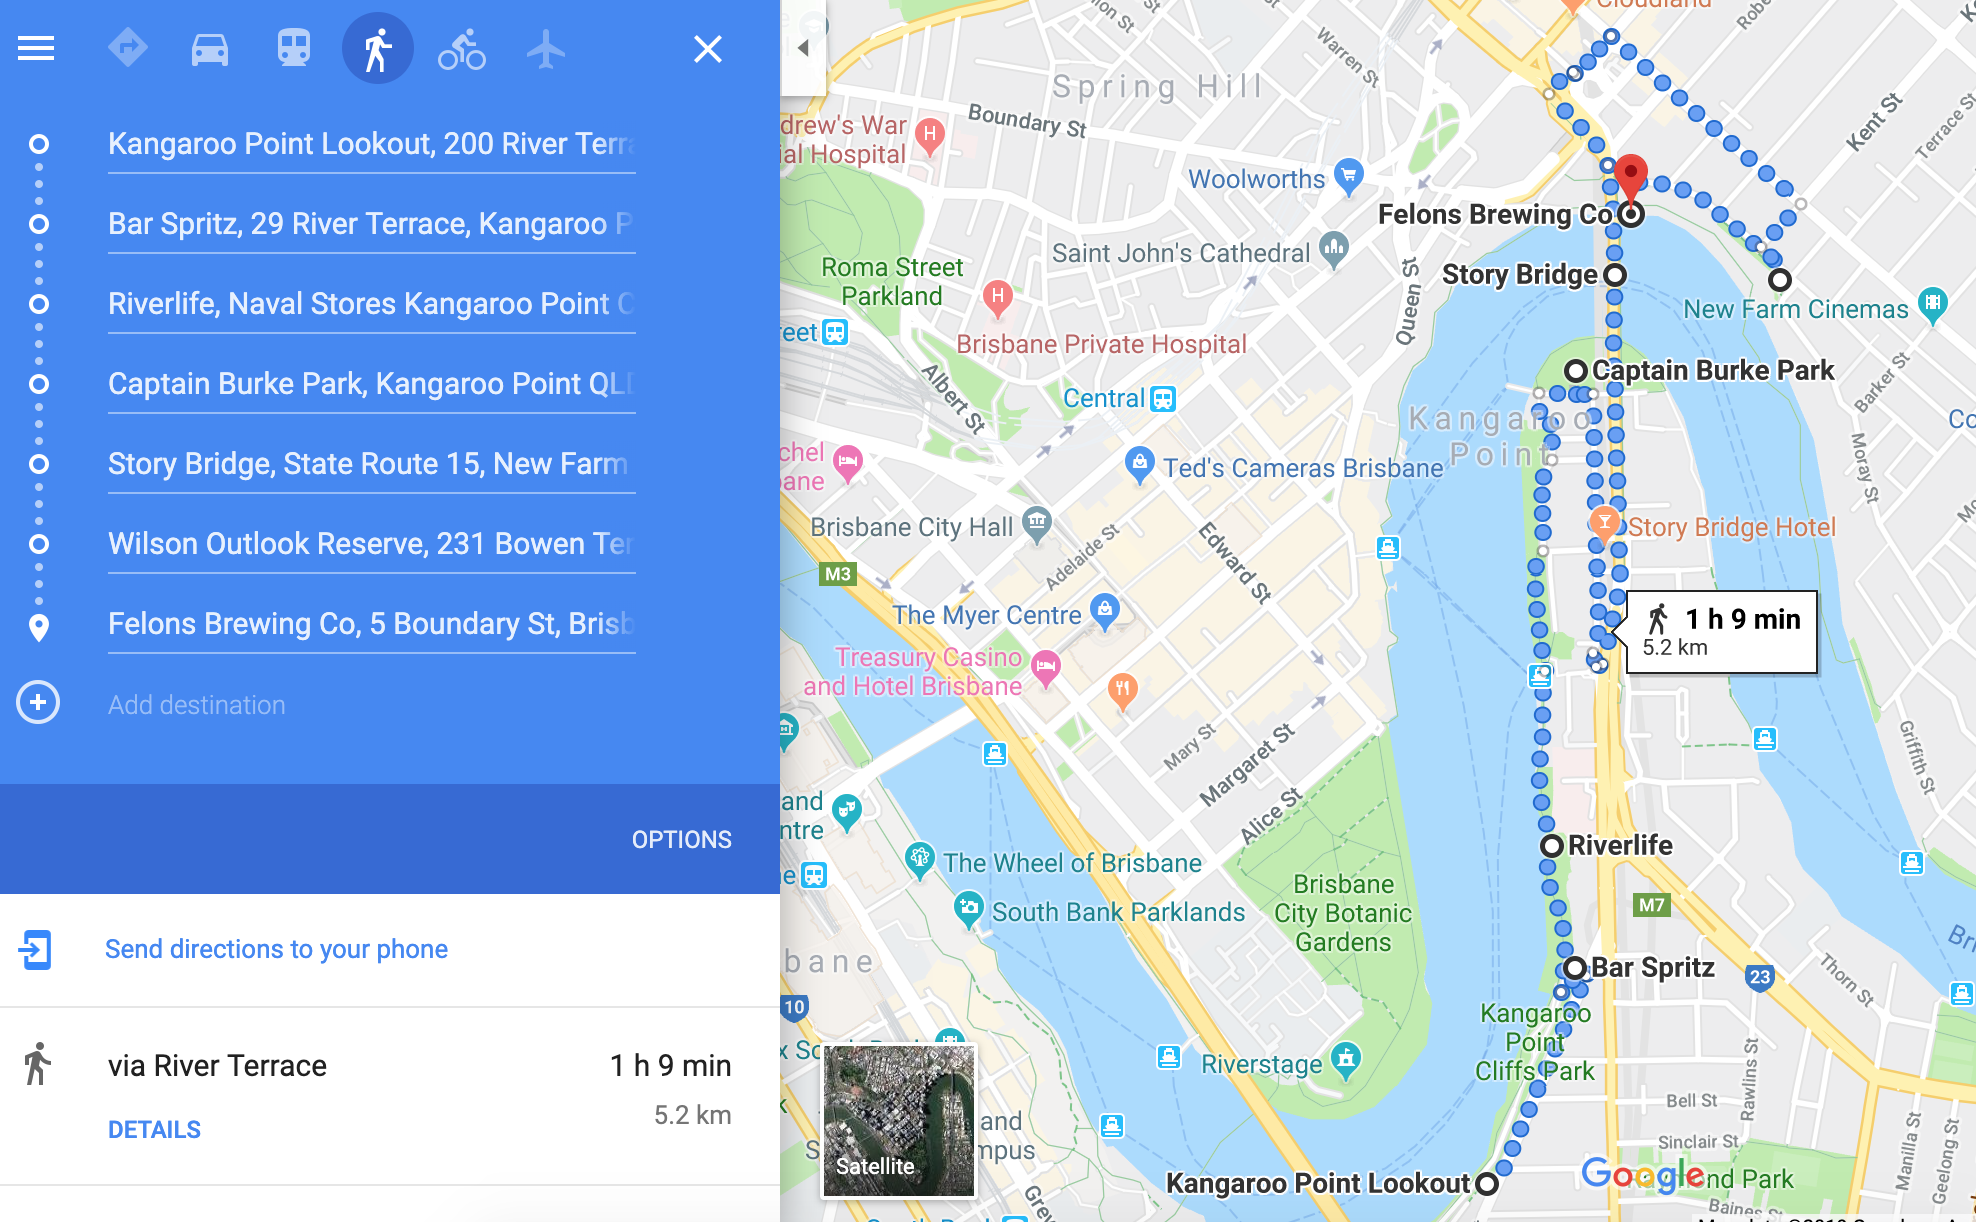 Google Map Walking Route